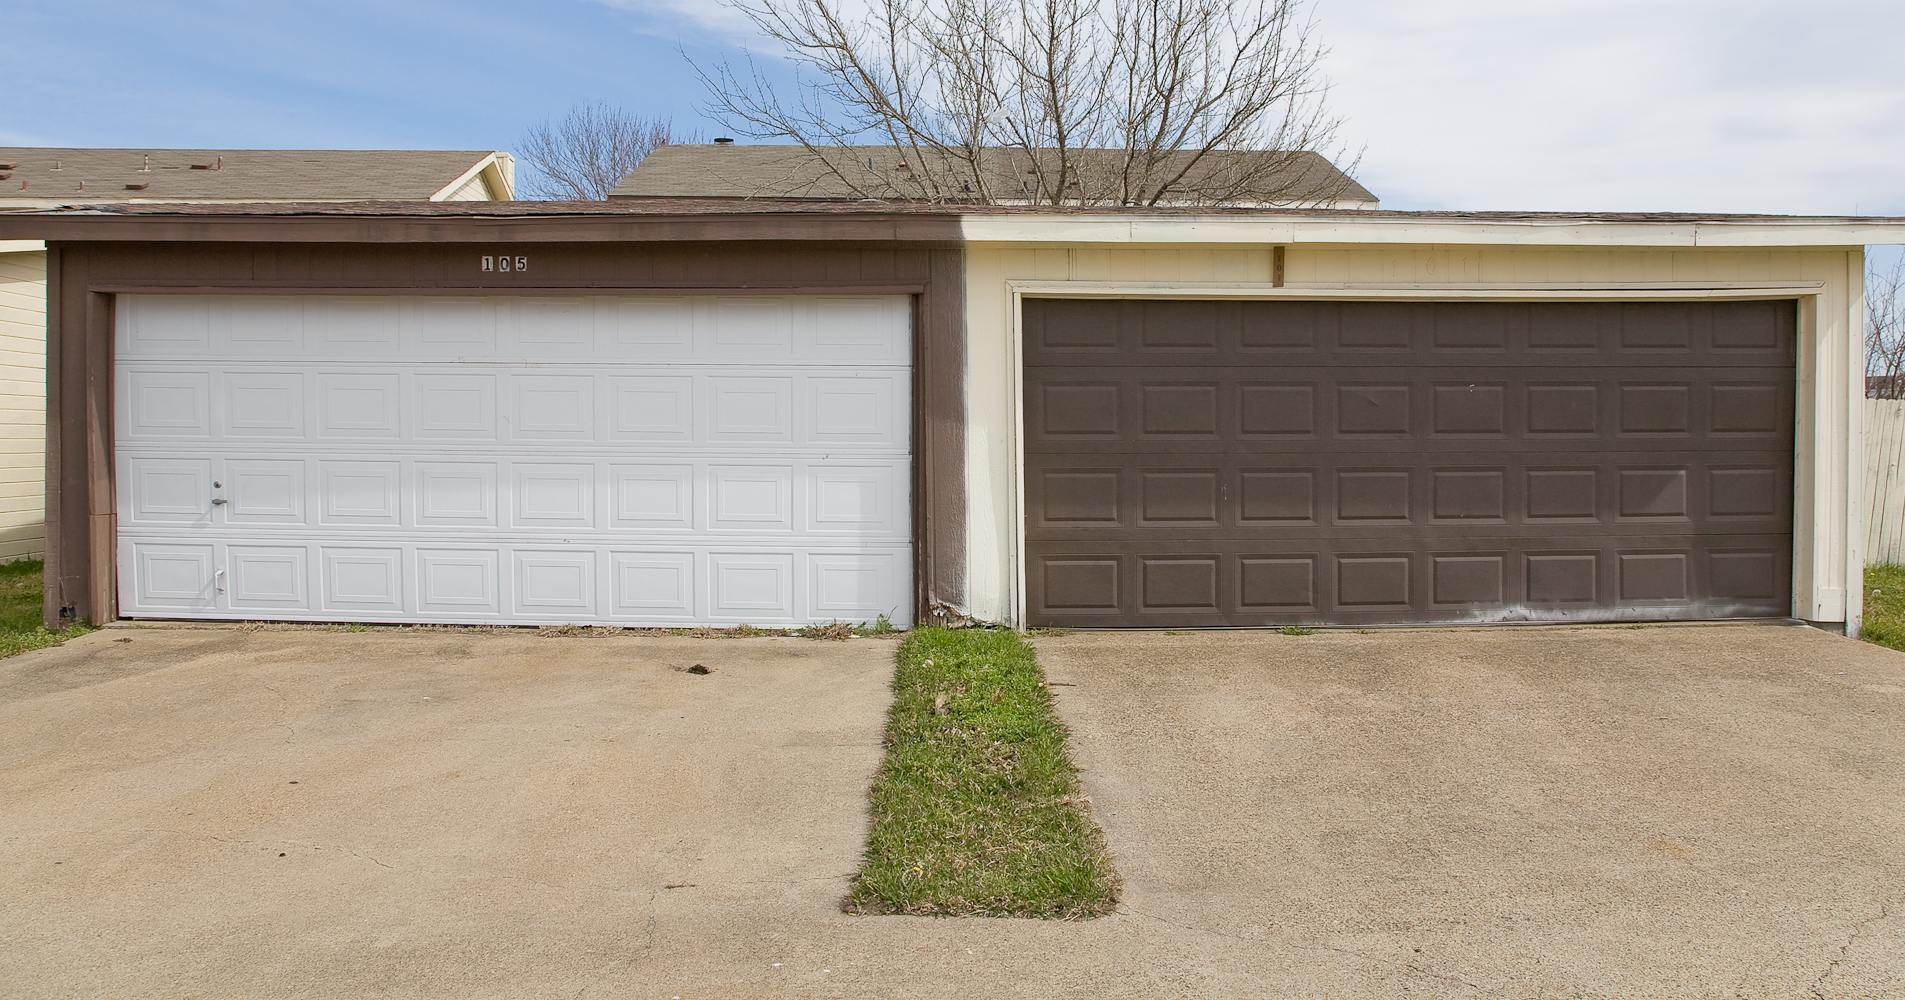 Duplex Homes 2 (4 of 9).jpg